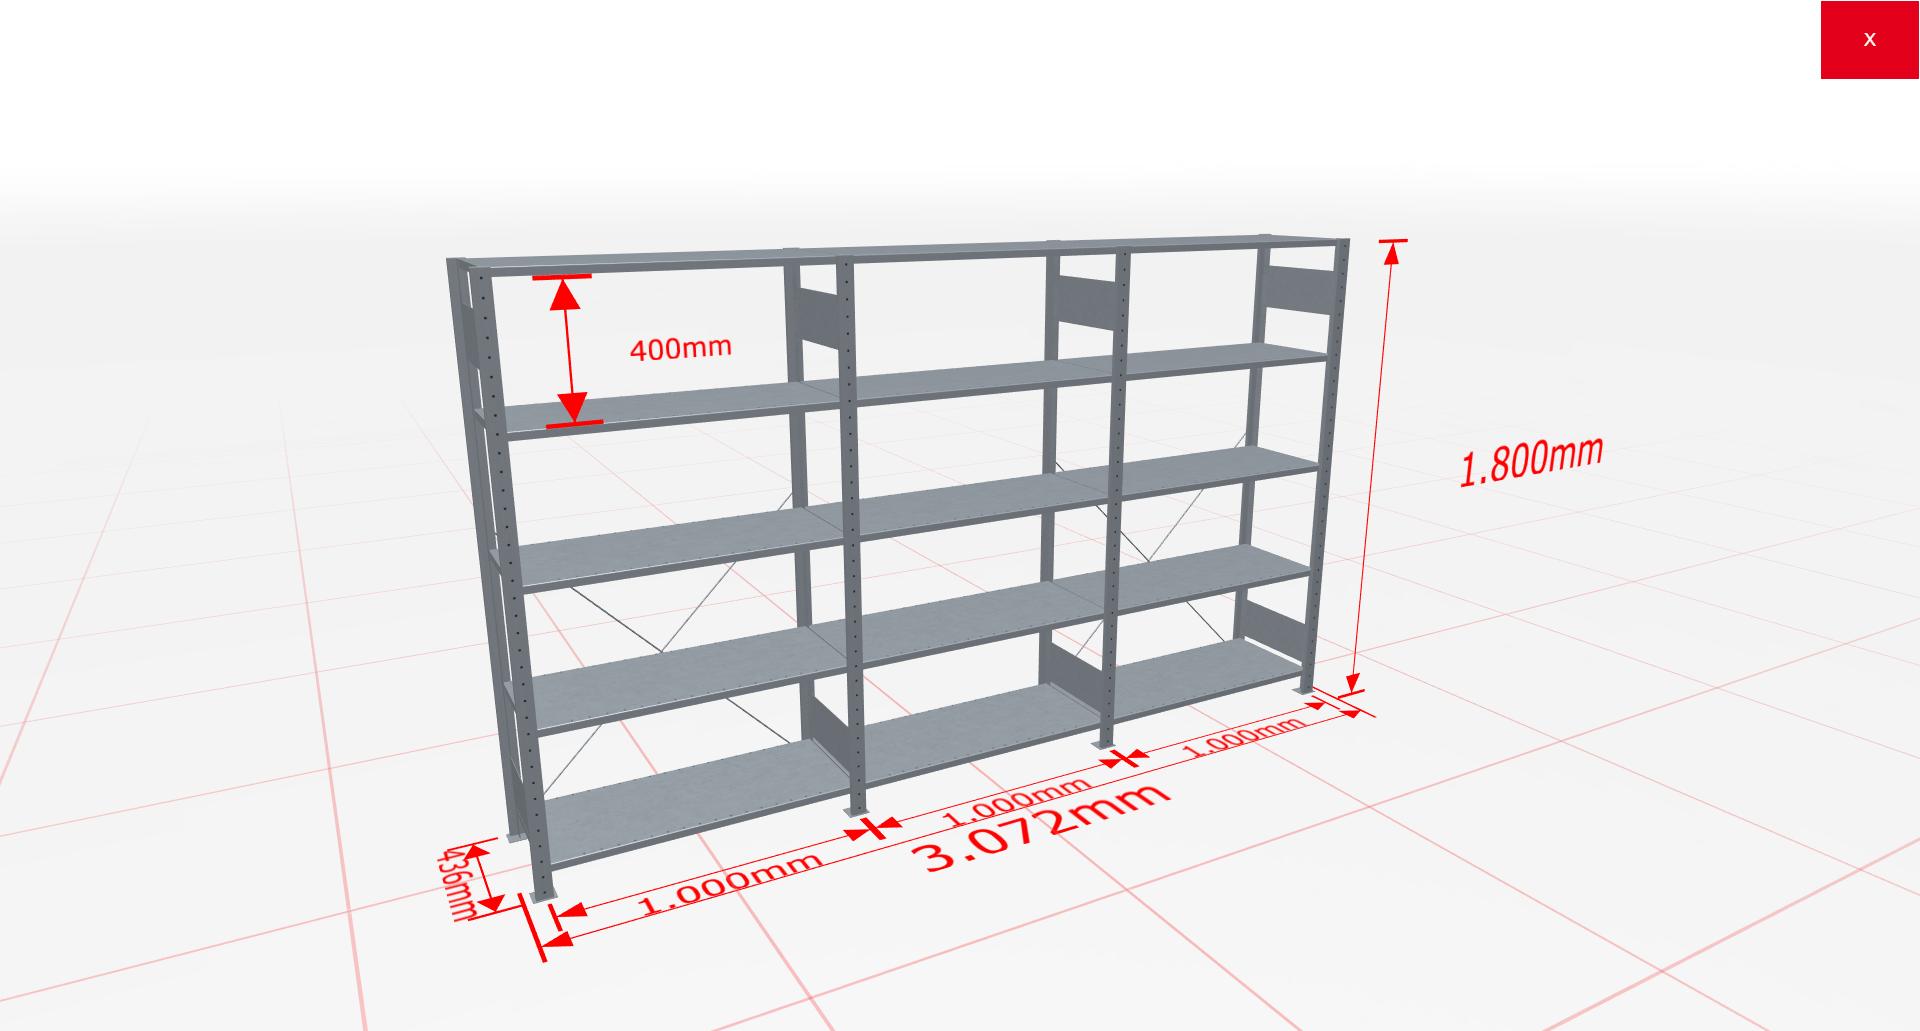 Fachbodenregal Komplettregal 1800x3072x400 mm (HxBxT) SCHULTE Lagertechnik verzinkt 5 Ebenen  150 kg je Boden